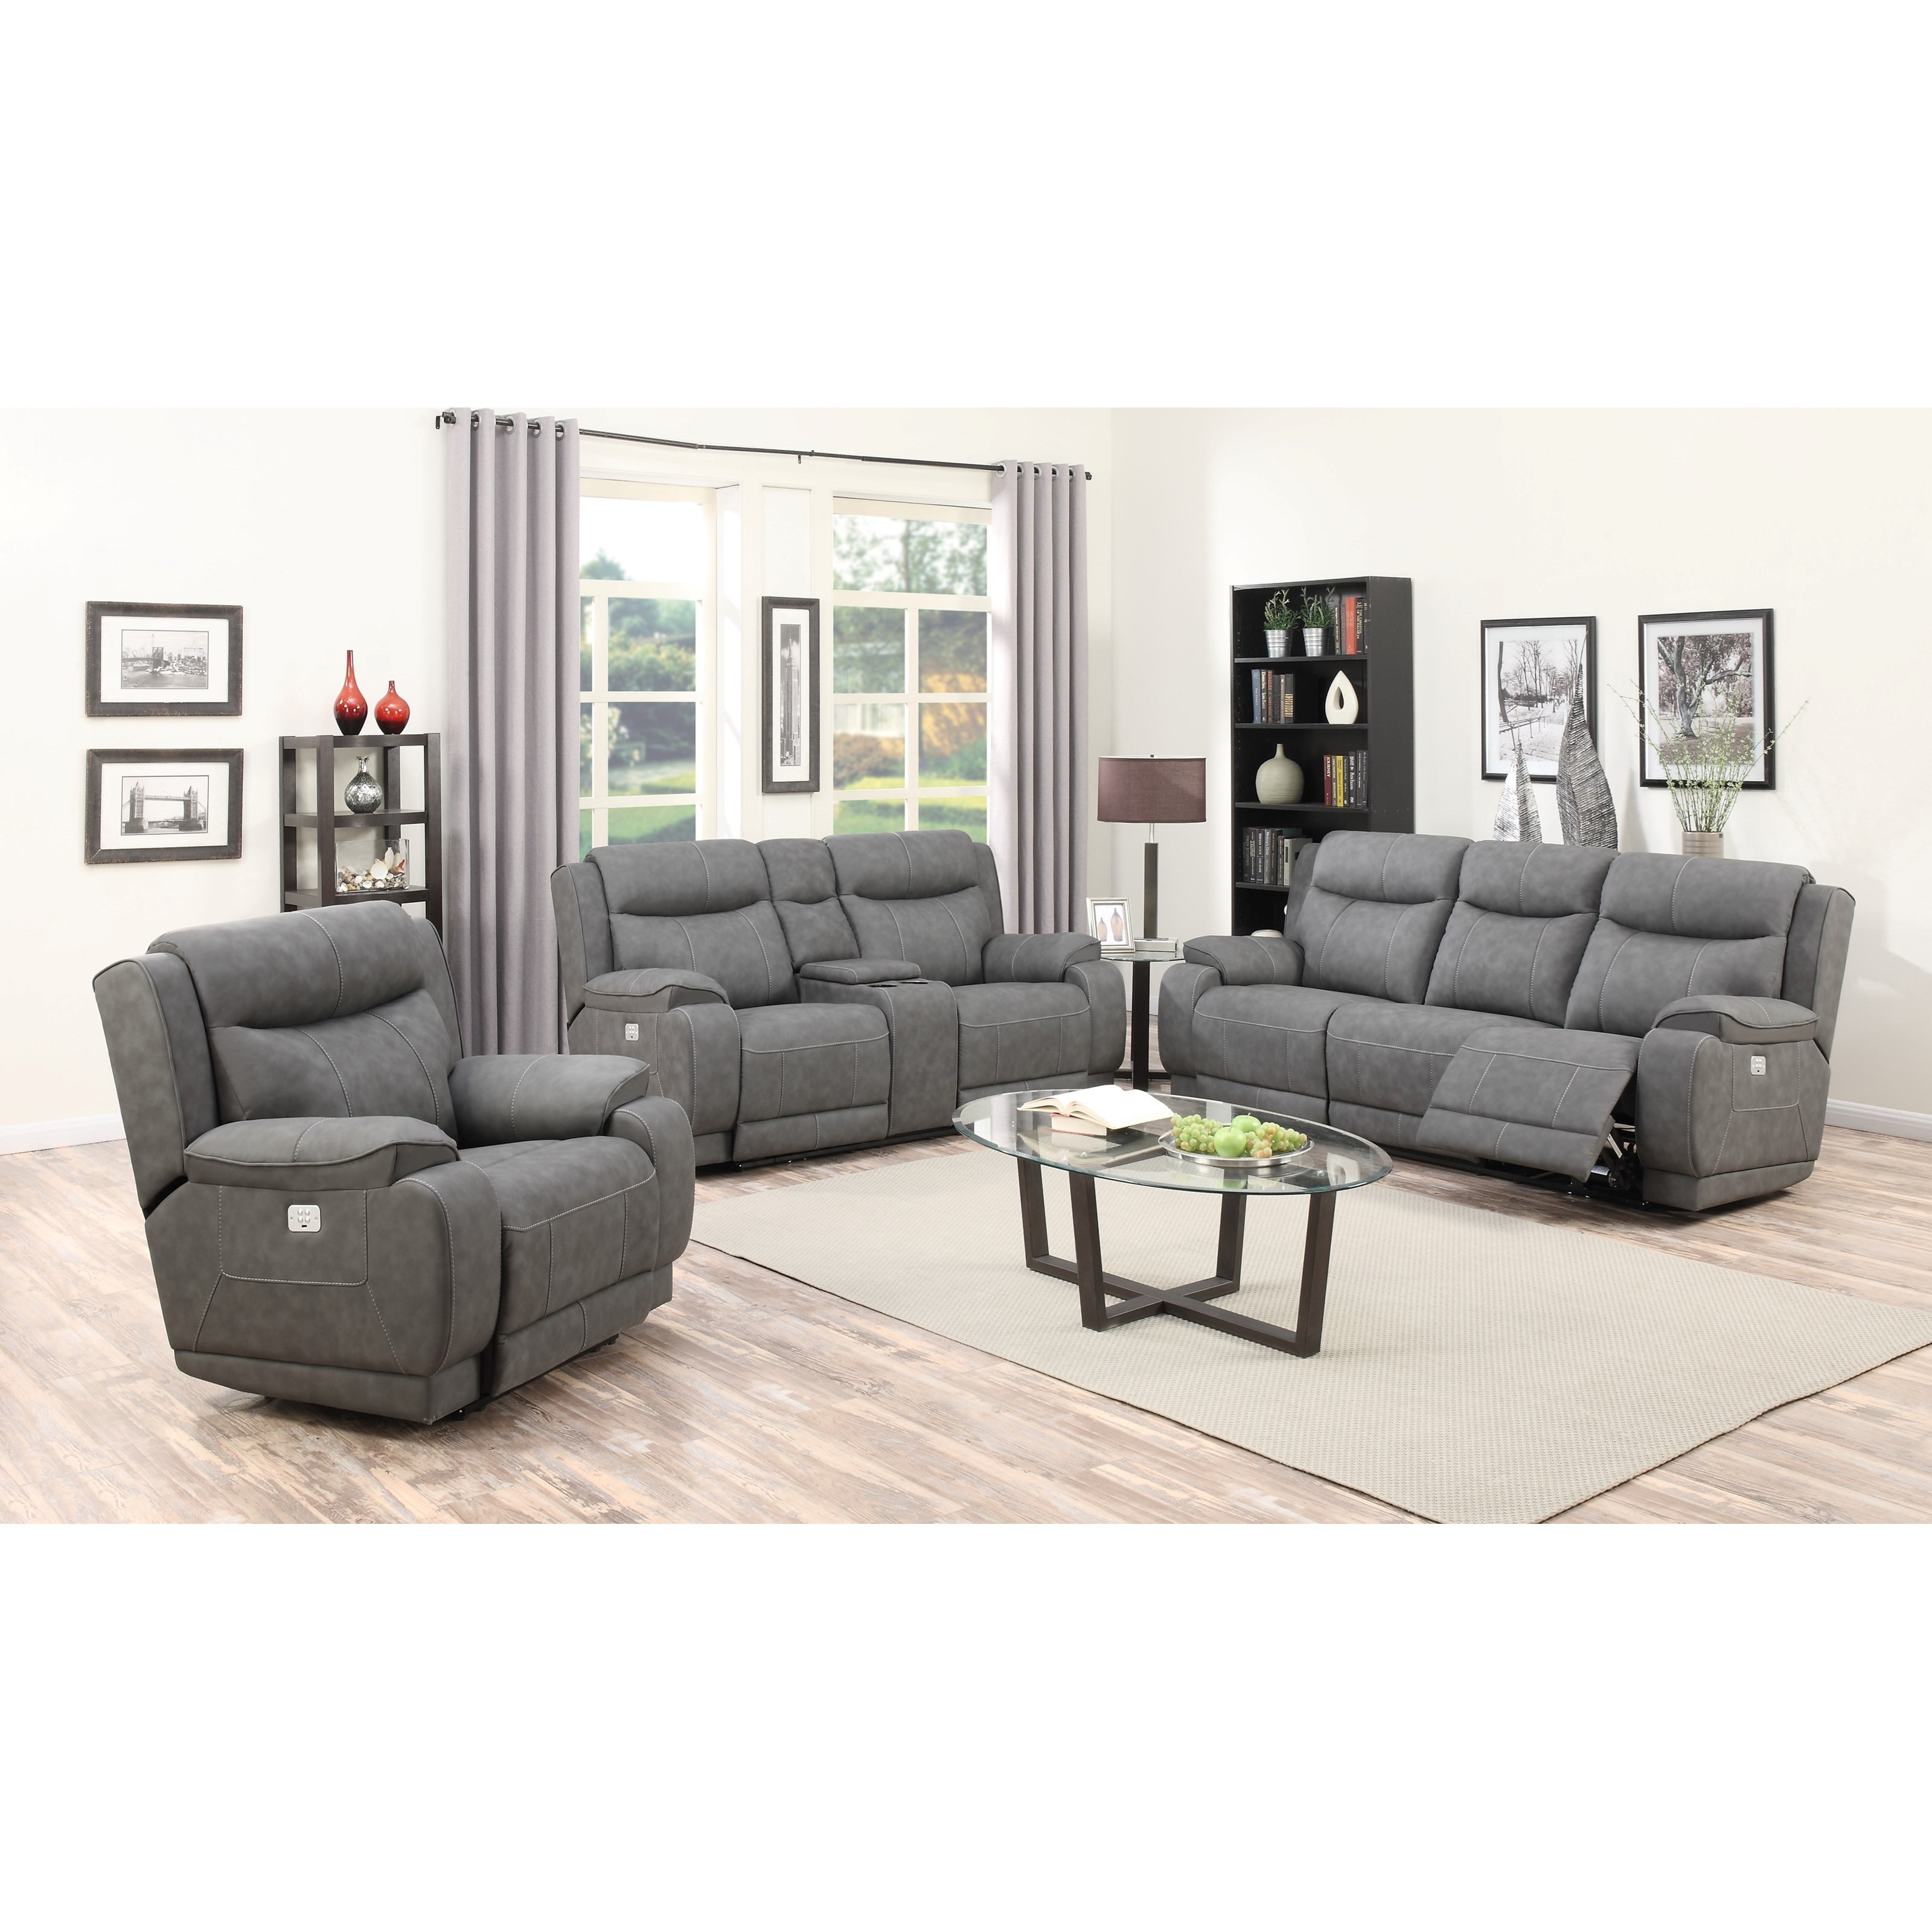 Humphrey-US Reclining Living Room Group by Klaussner International at Nassau Furniture and Mattress